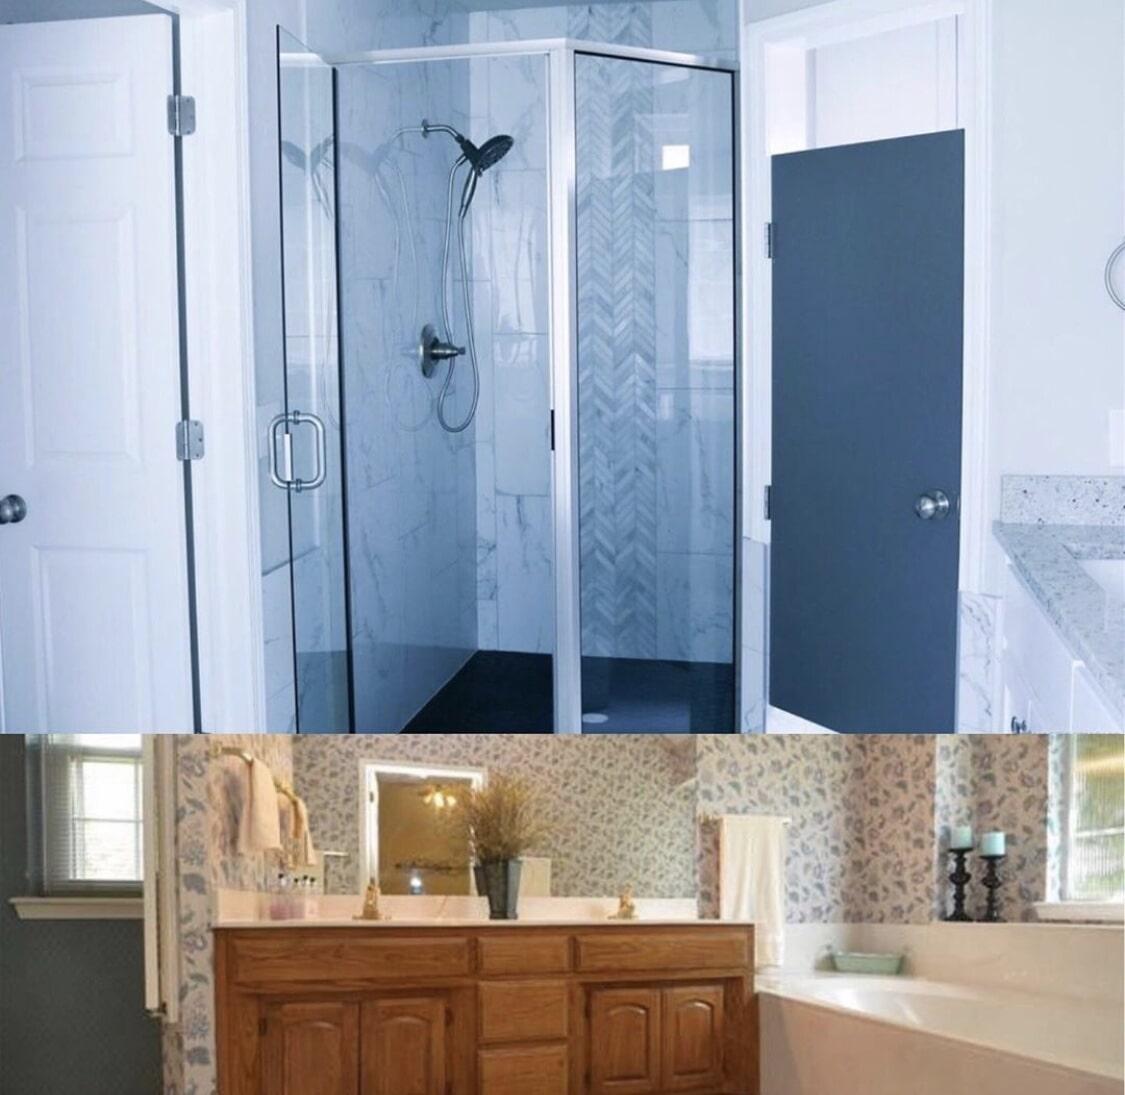 Bathroom remodel in Jenks, OK from Superior Wood Floors & Tile